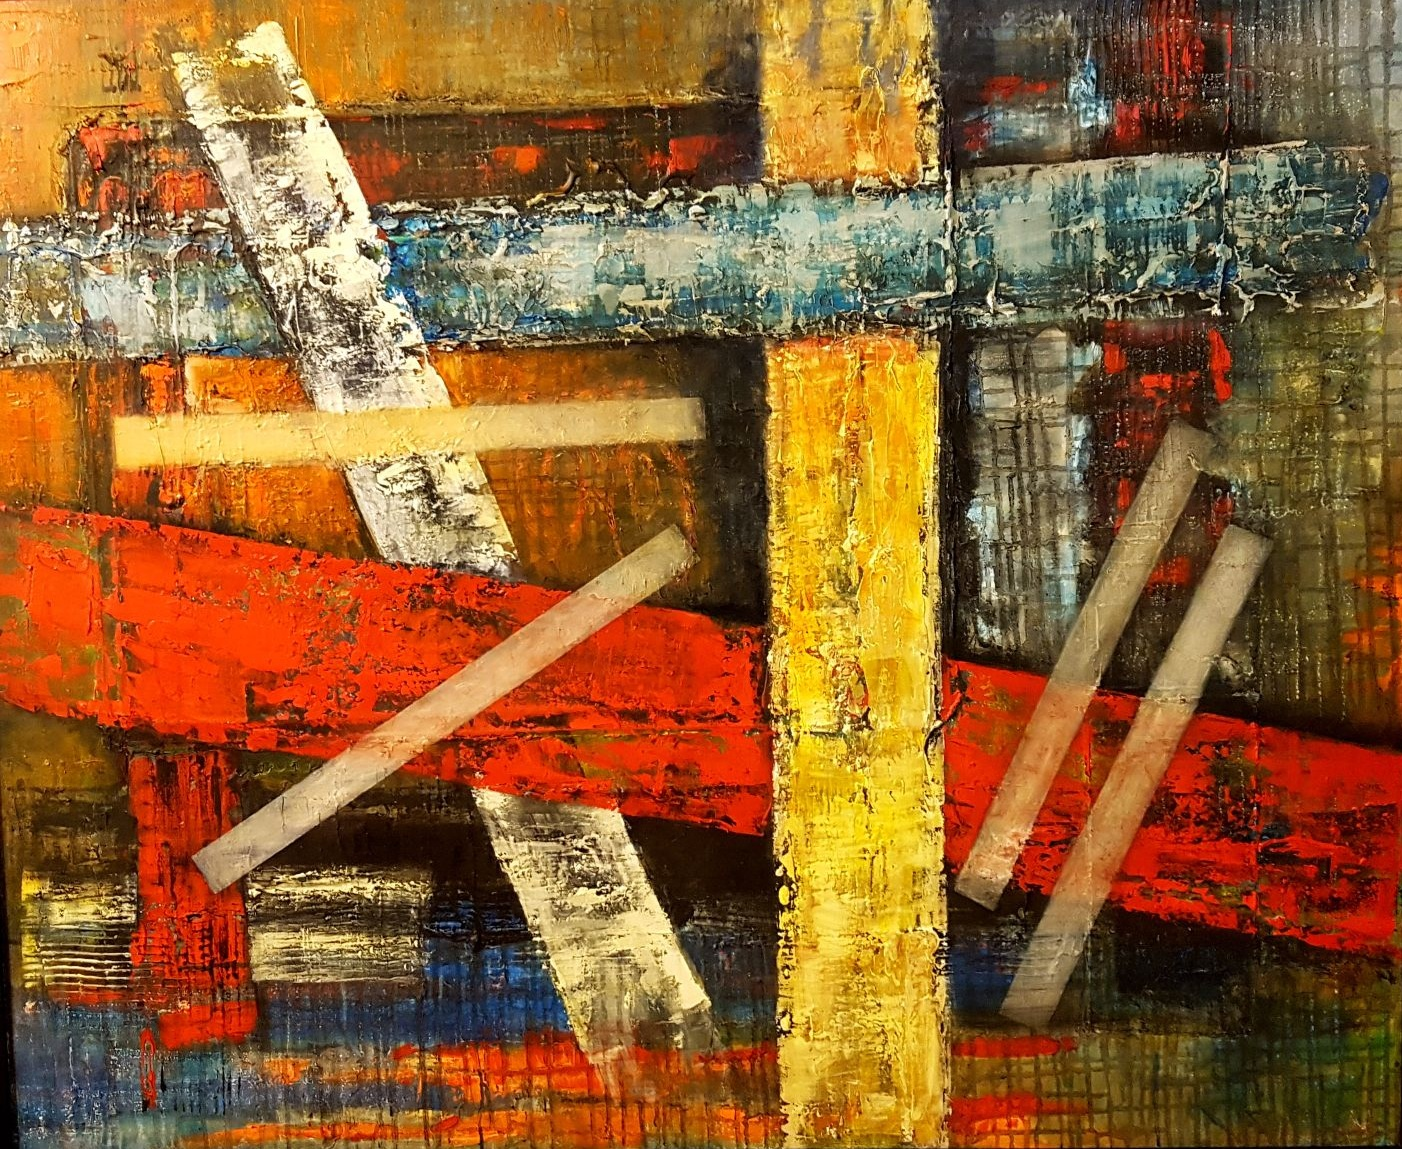 ESPACIOS DE SANAR, oleo sobre tela, 100 x 120 cm, Teresa Cabo, 2017